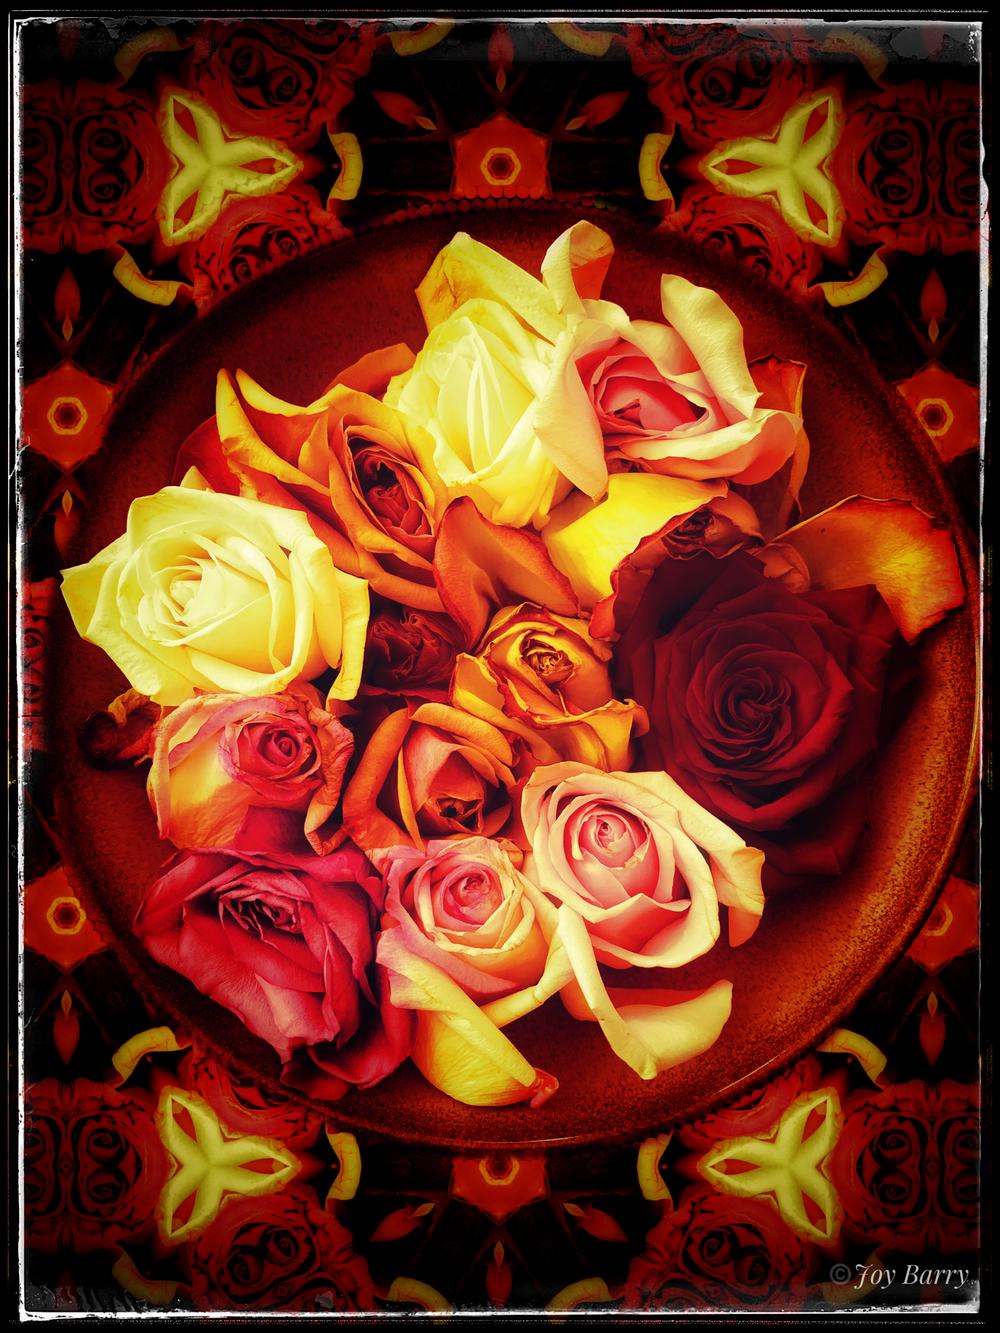 March 15, 2019 - A Riot of Roses; a Plethora of Petals.